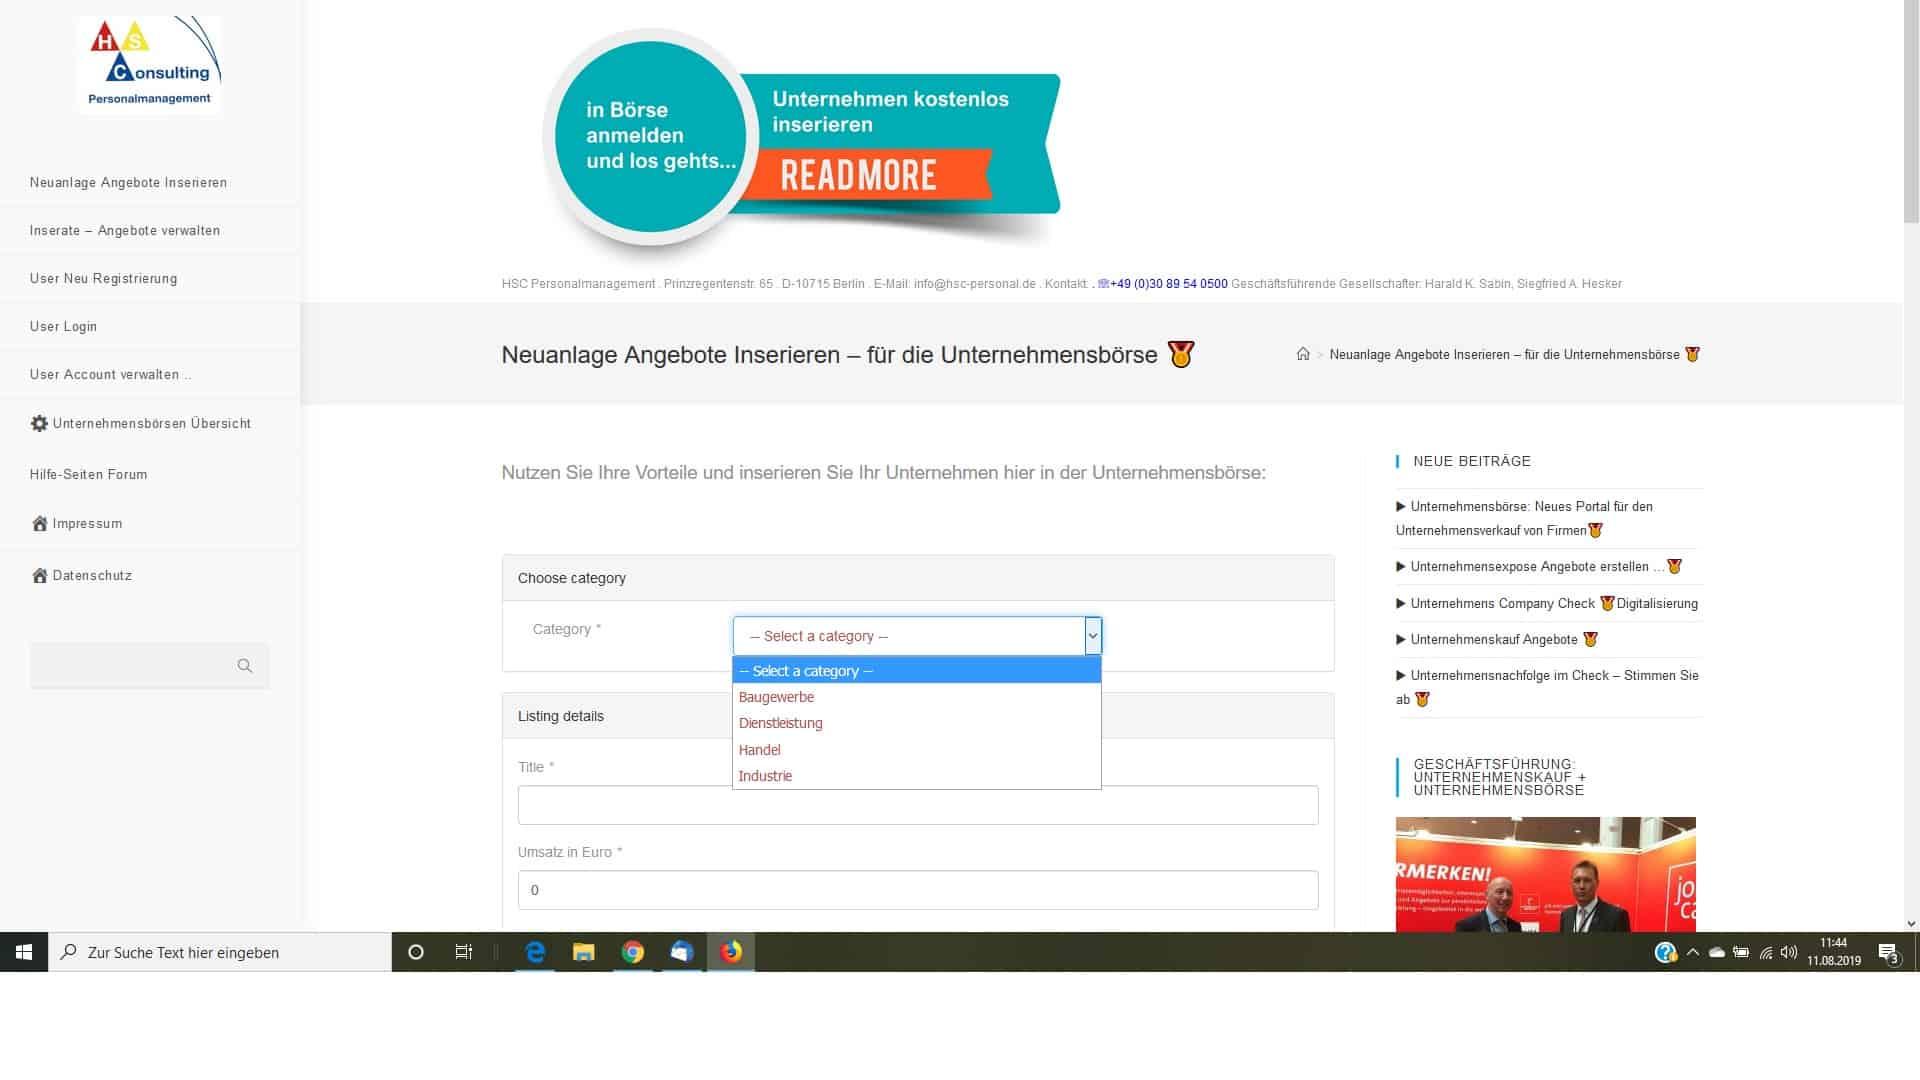 Portale Unternehmensbörse Neuanlage Category auswählen